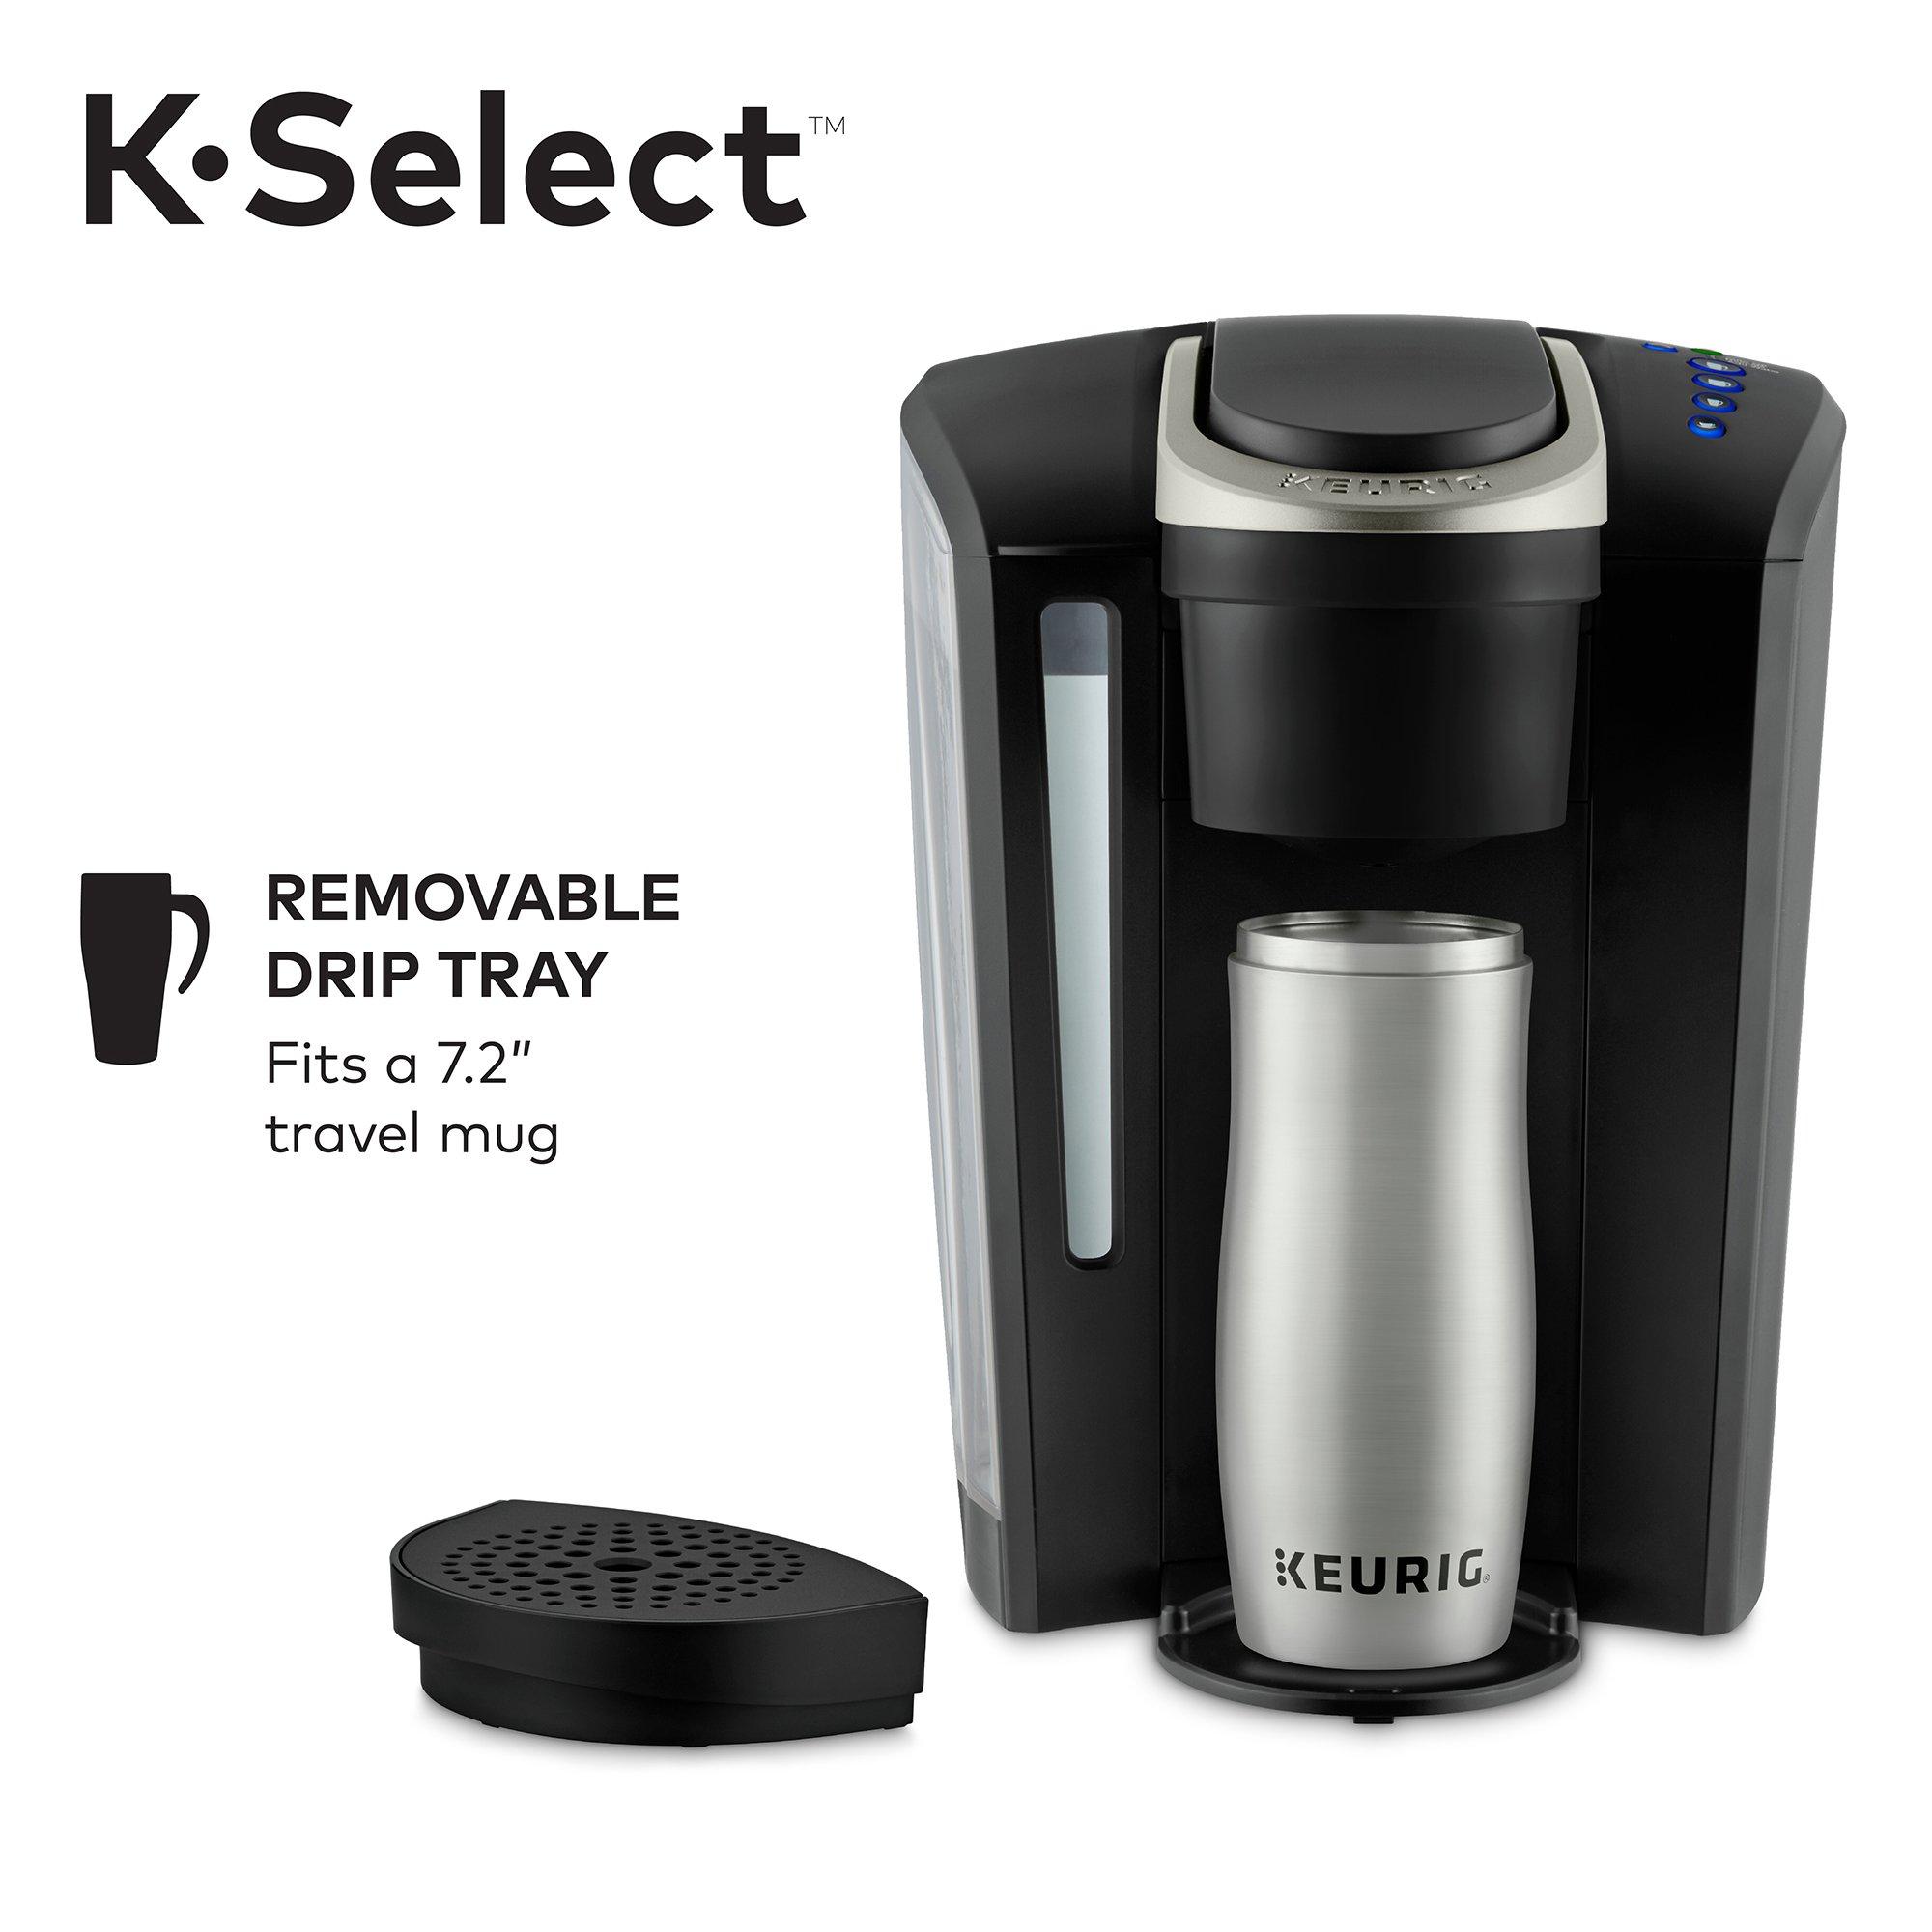 Keurig K-Select Single-Serve K-Cup Pod Coffee Maker with 12oz Brew Size, Strength Control, Matte Black by Keurig (Image #3)